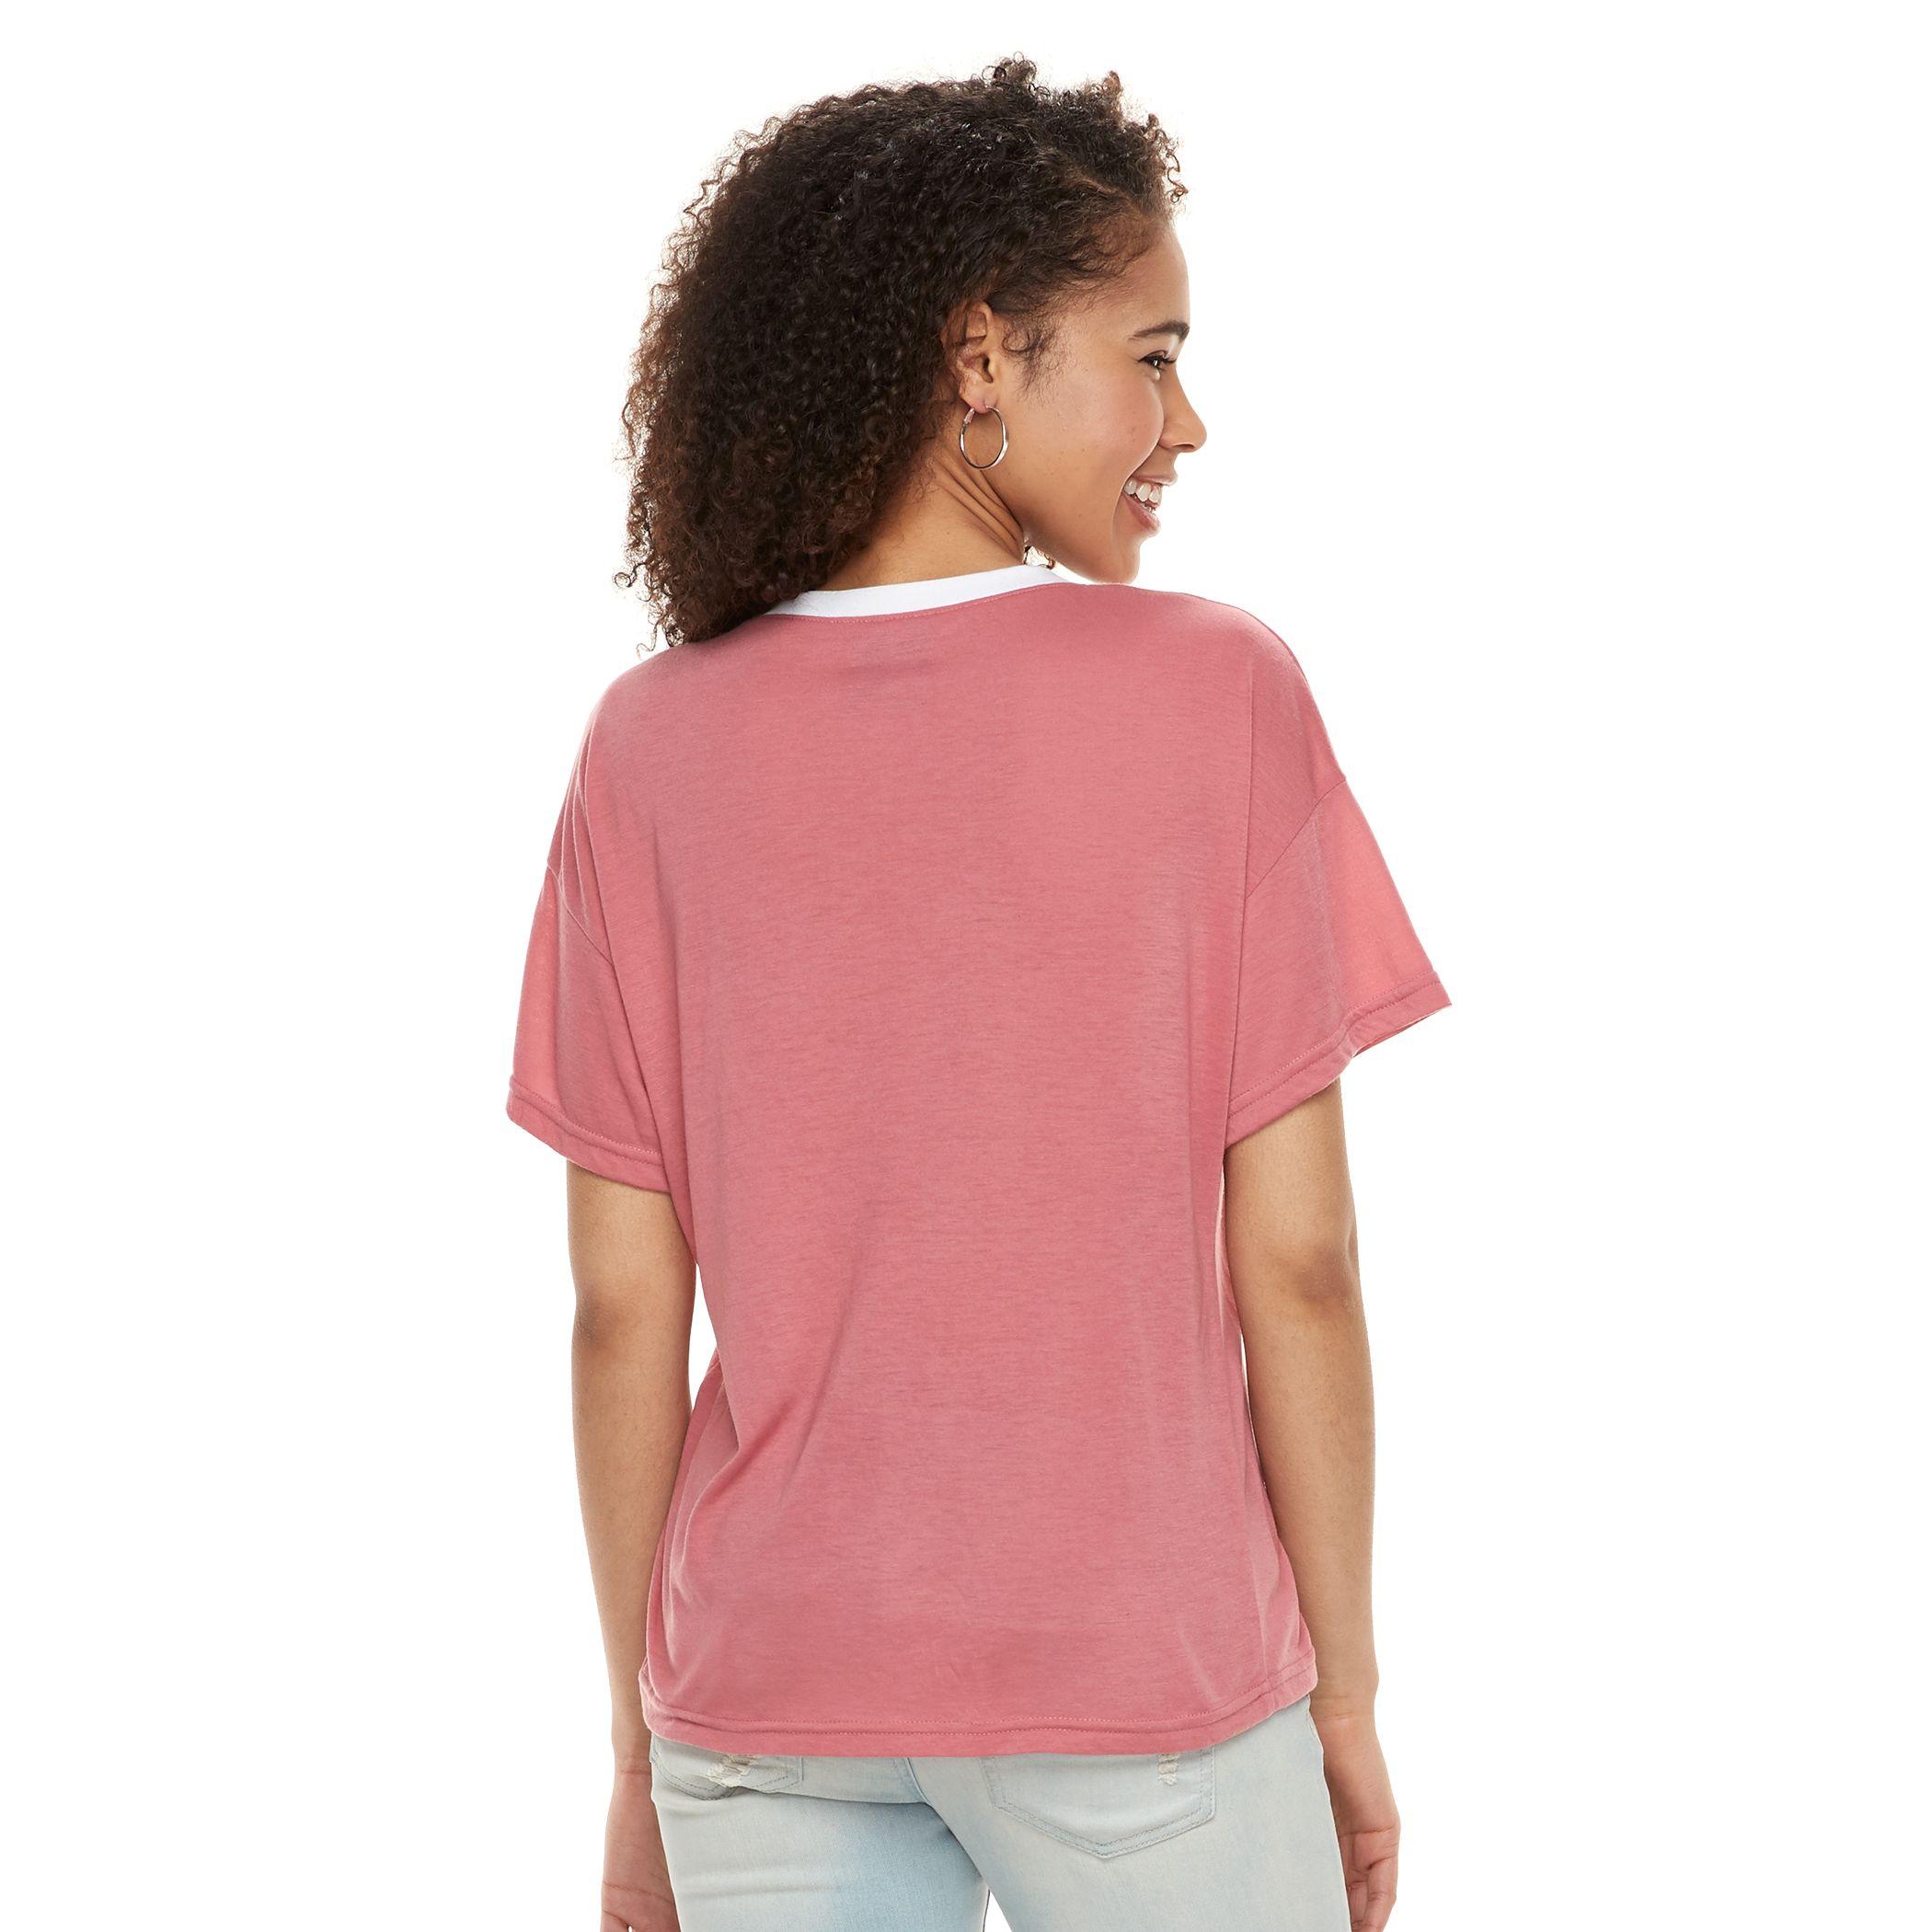 65f468bc6 Cute Disney Shirts For Juniors – DACC